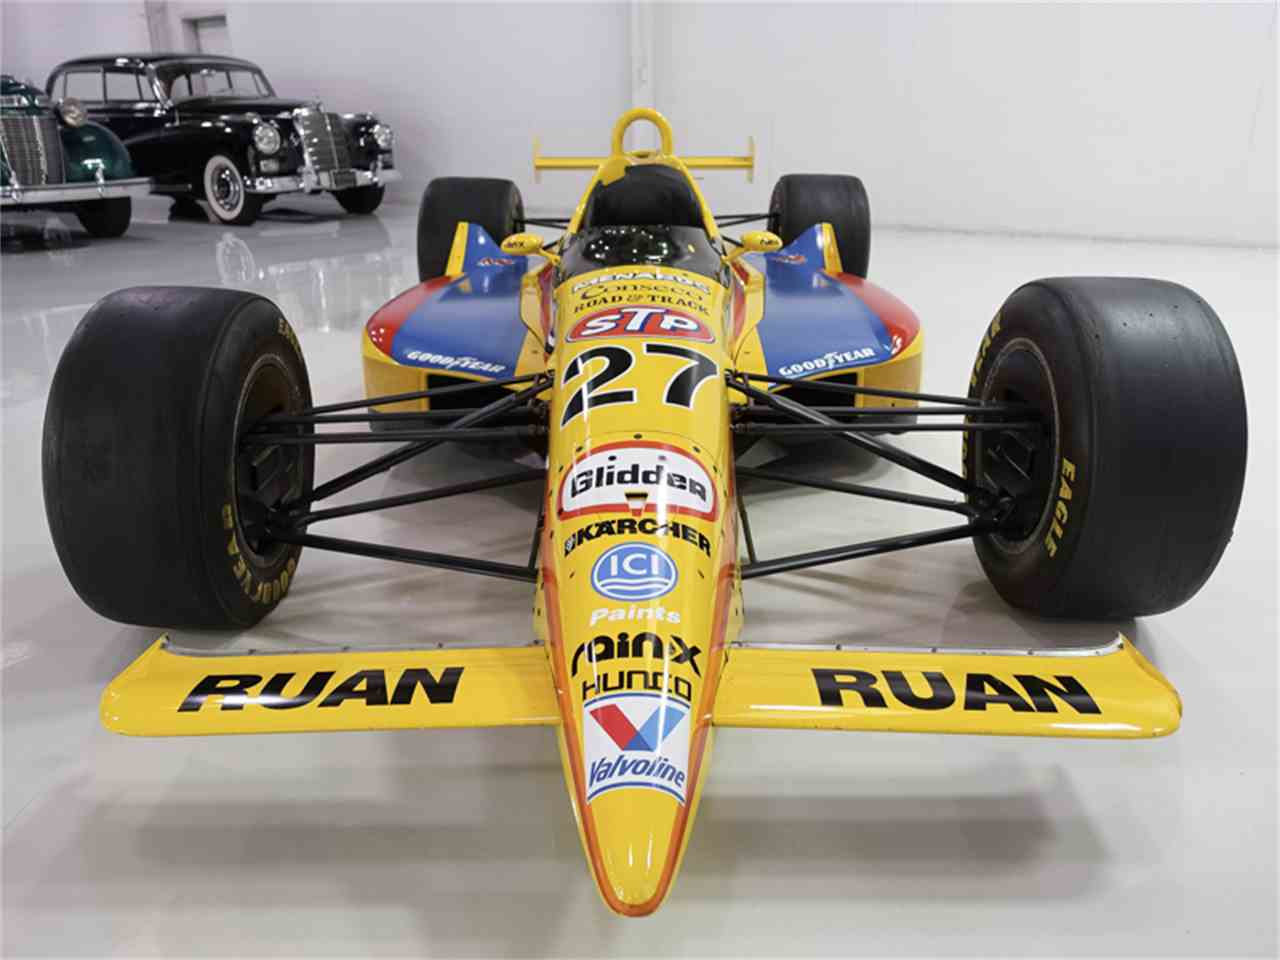 1992 Lola Race Car for Sale | ClassicCars.com | CC-1064632